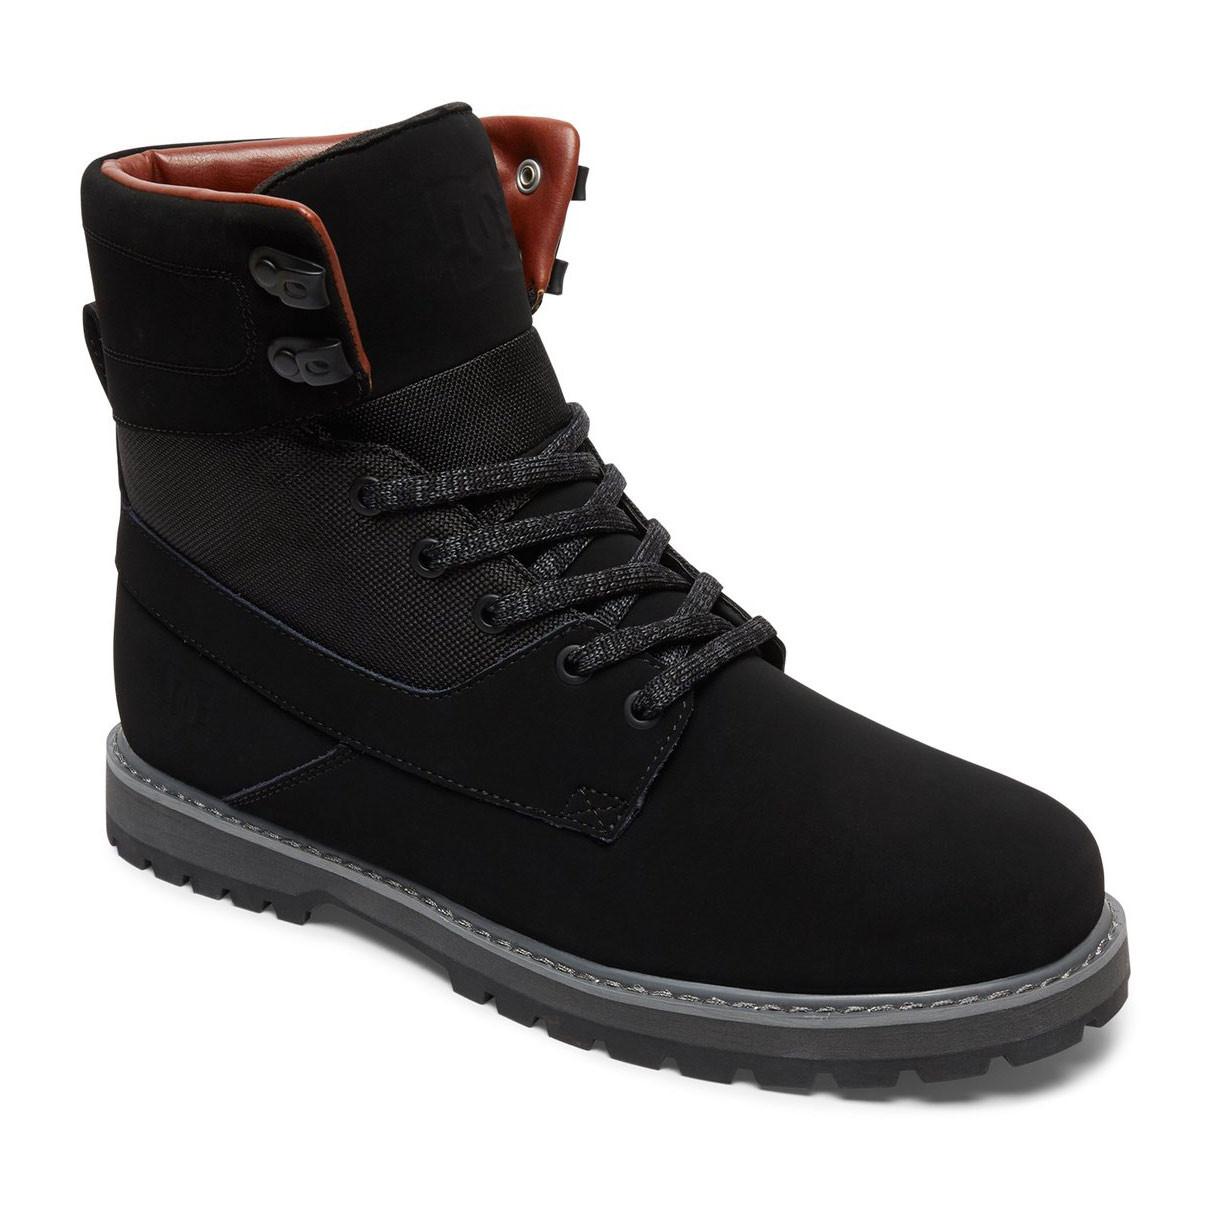 Zimní boty DC Uncas black/black/dk grey